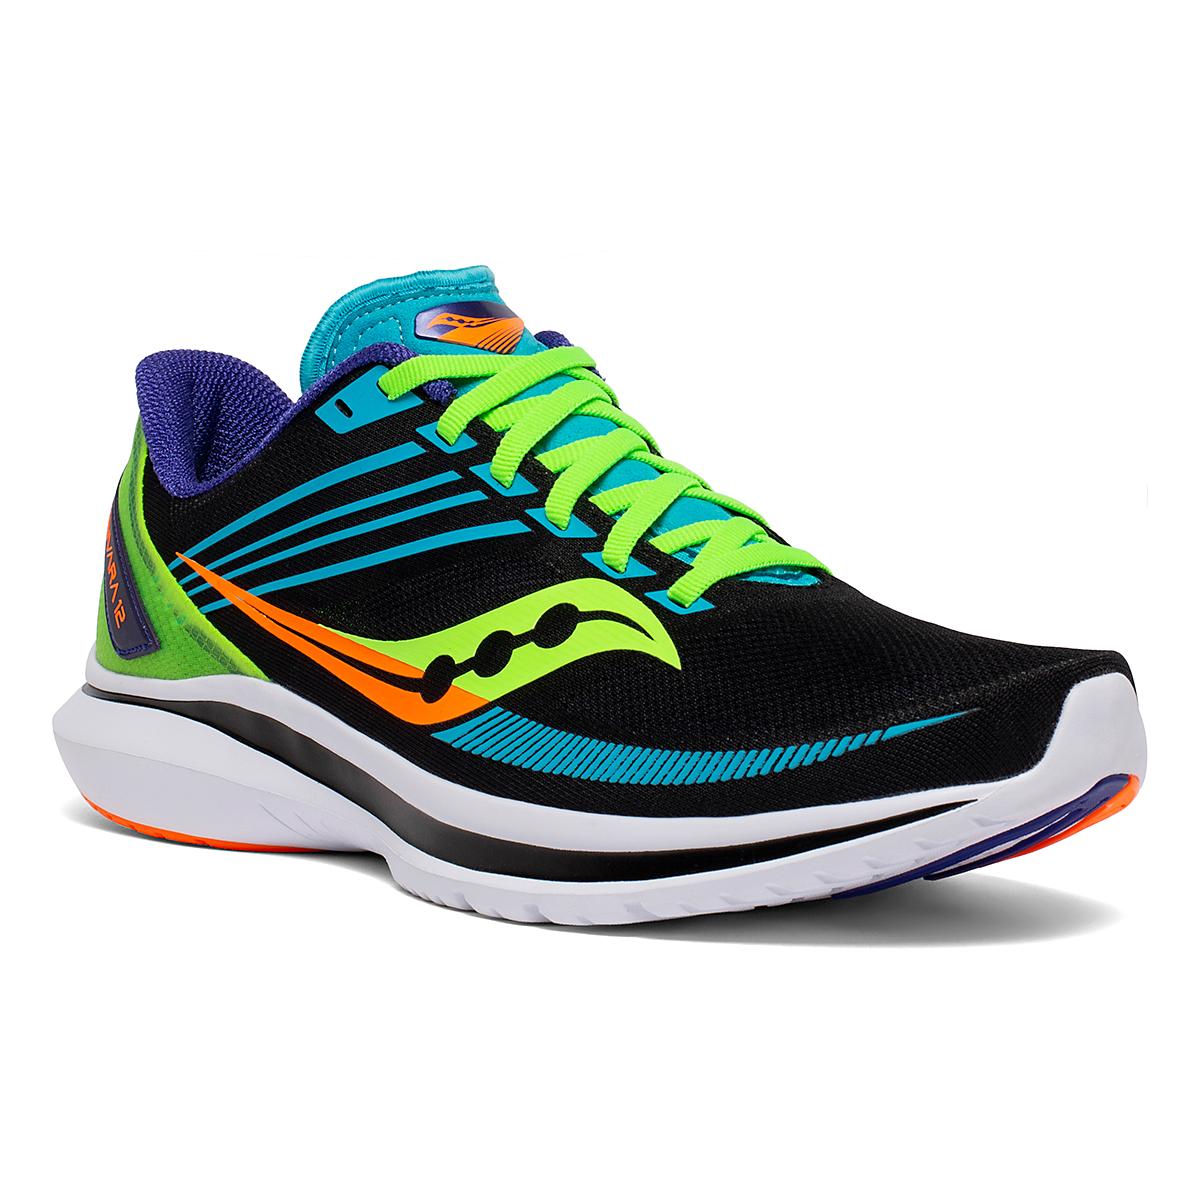 Men's Saucony Kinvara 12 Running Shoe - Color: Future/Black - Size: 7 - Width: Regular, Future/Black, large, image 3